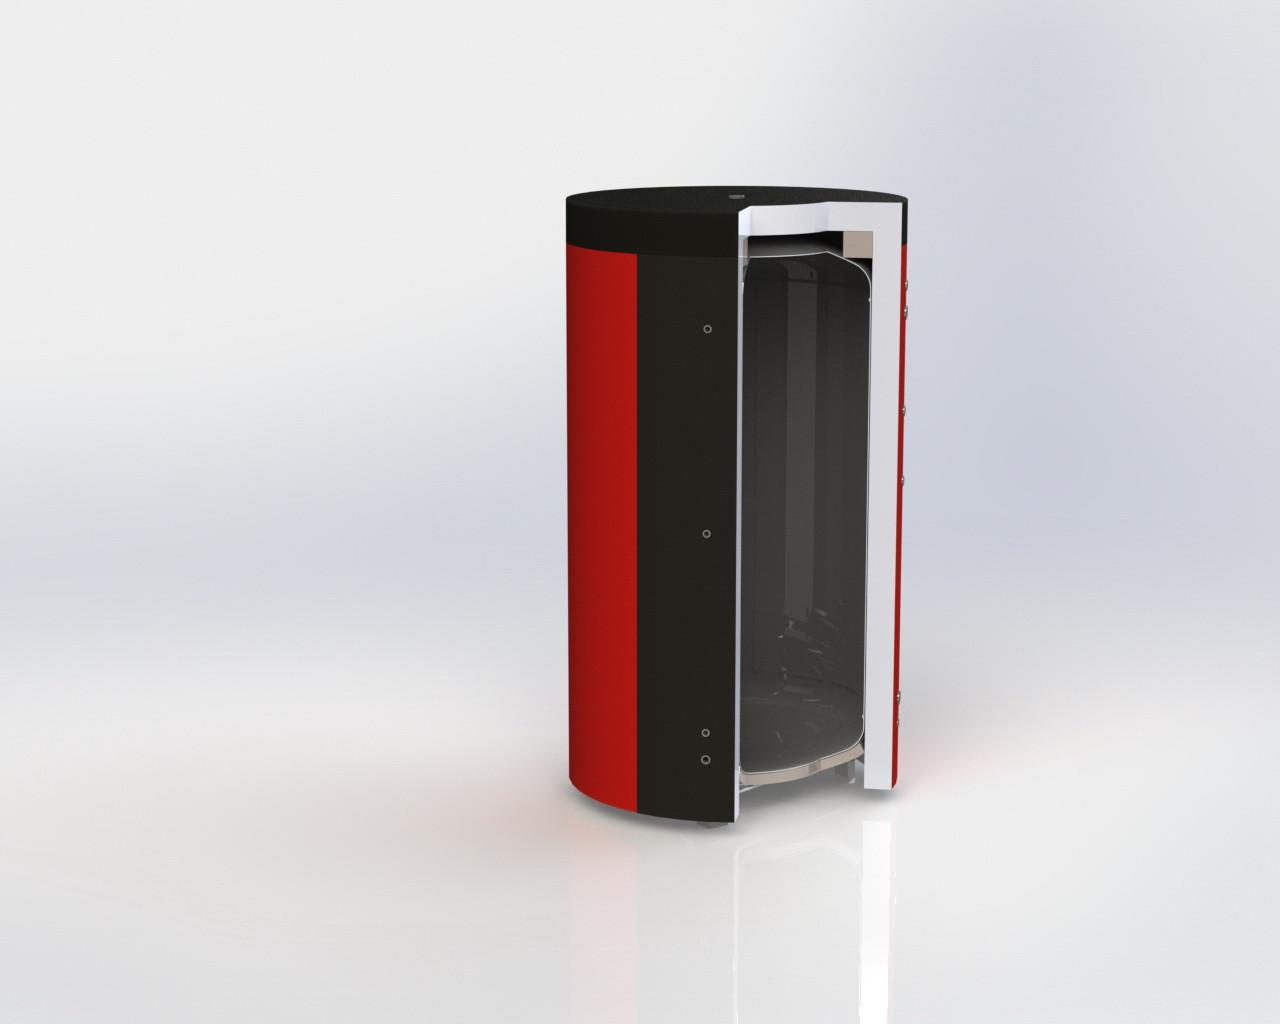 Теплоаккумулятор ЕА-00-10000 KHT